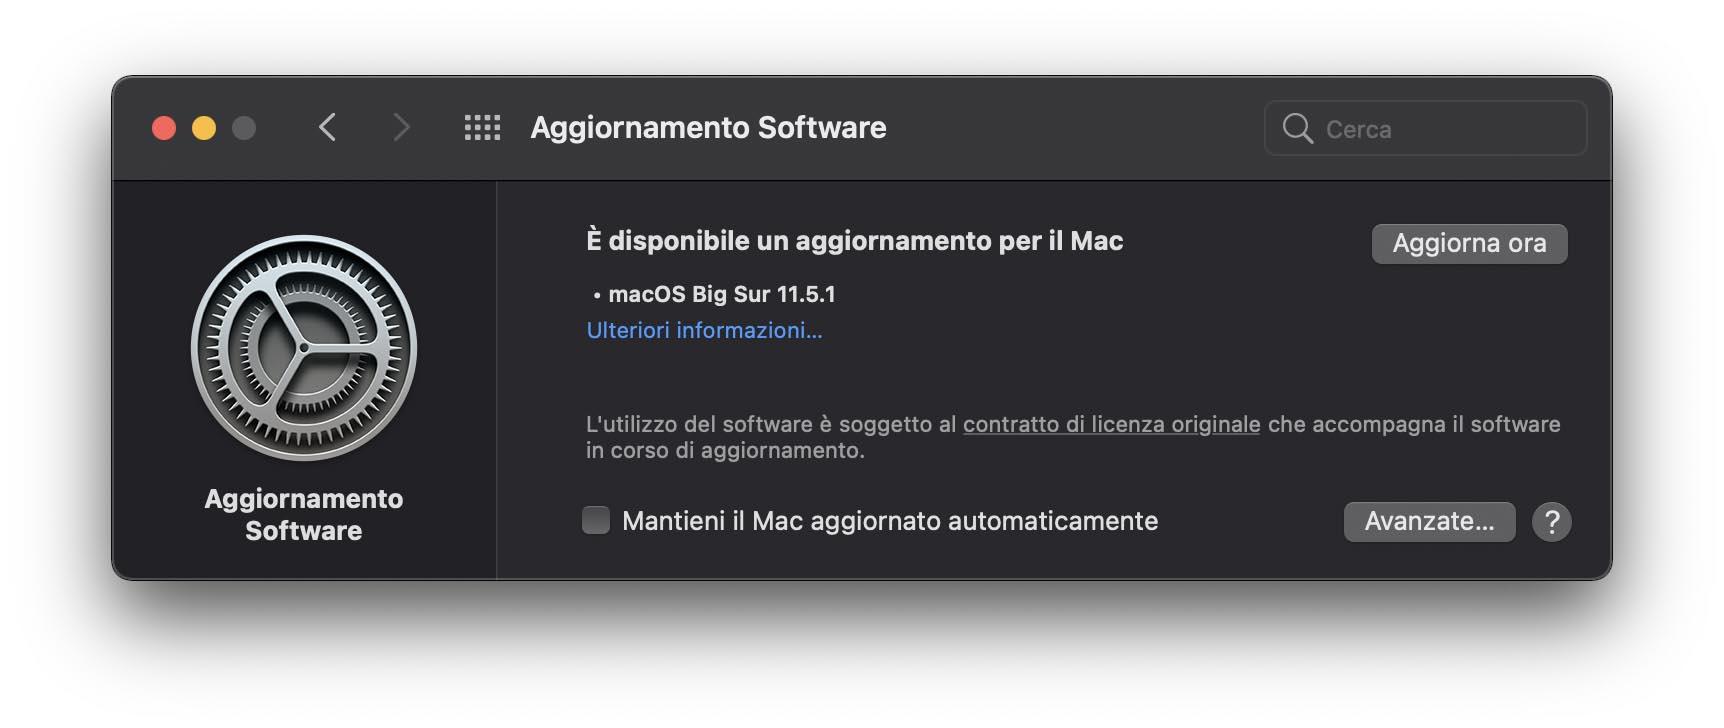 Disponibile aggiornamento a macOS Big Sur 11.5.1